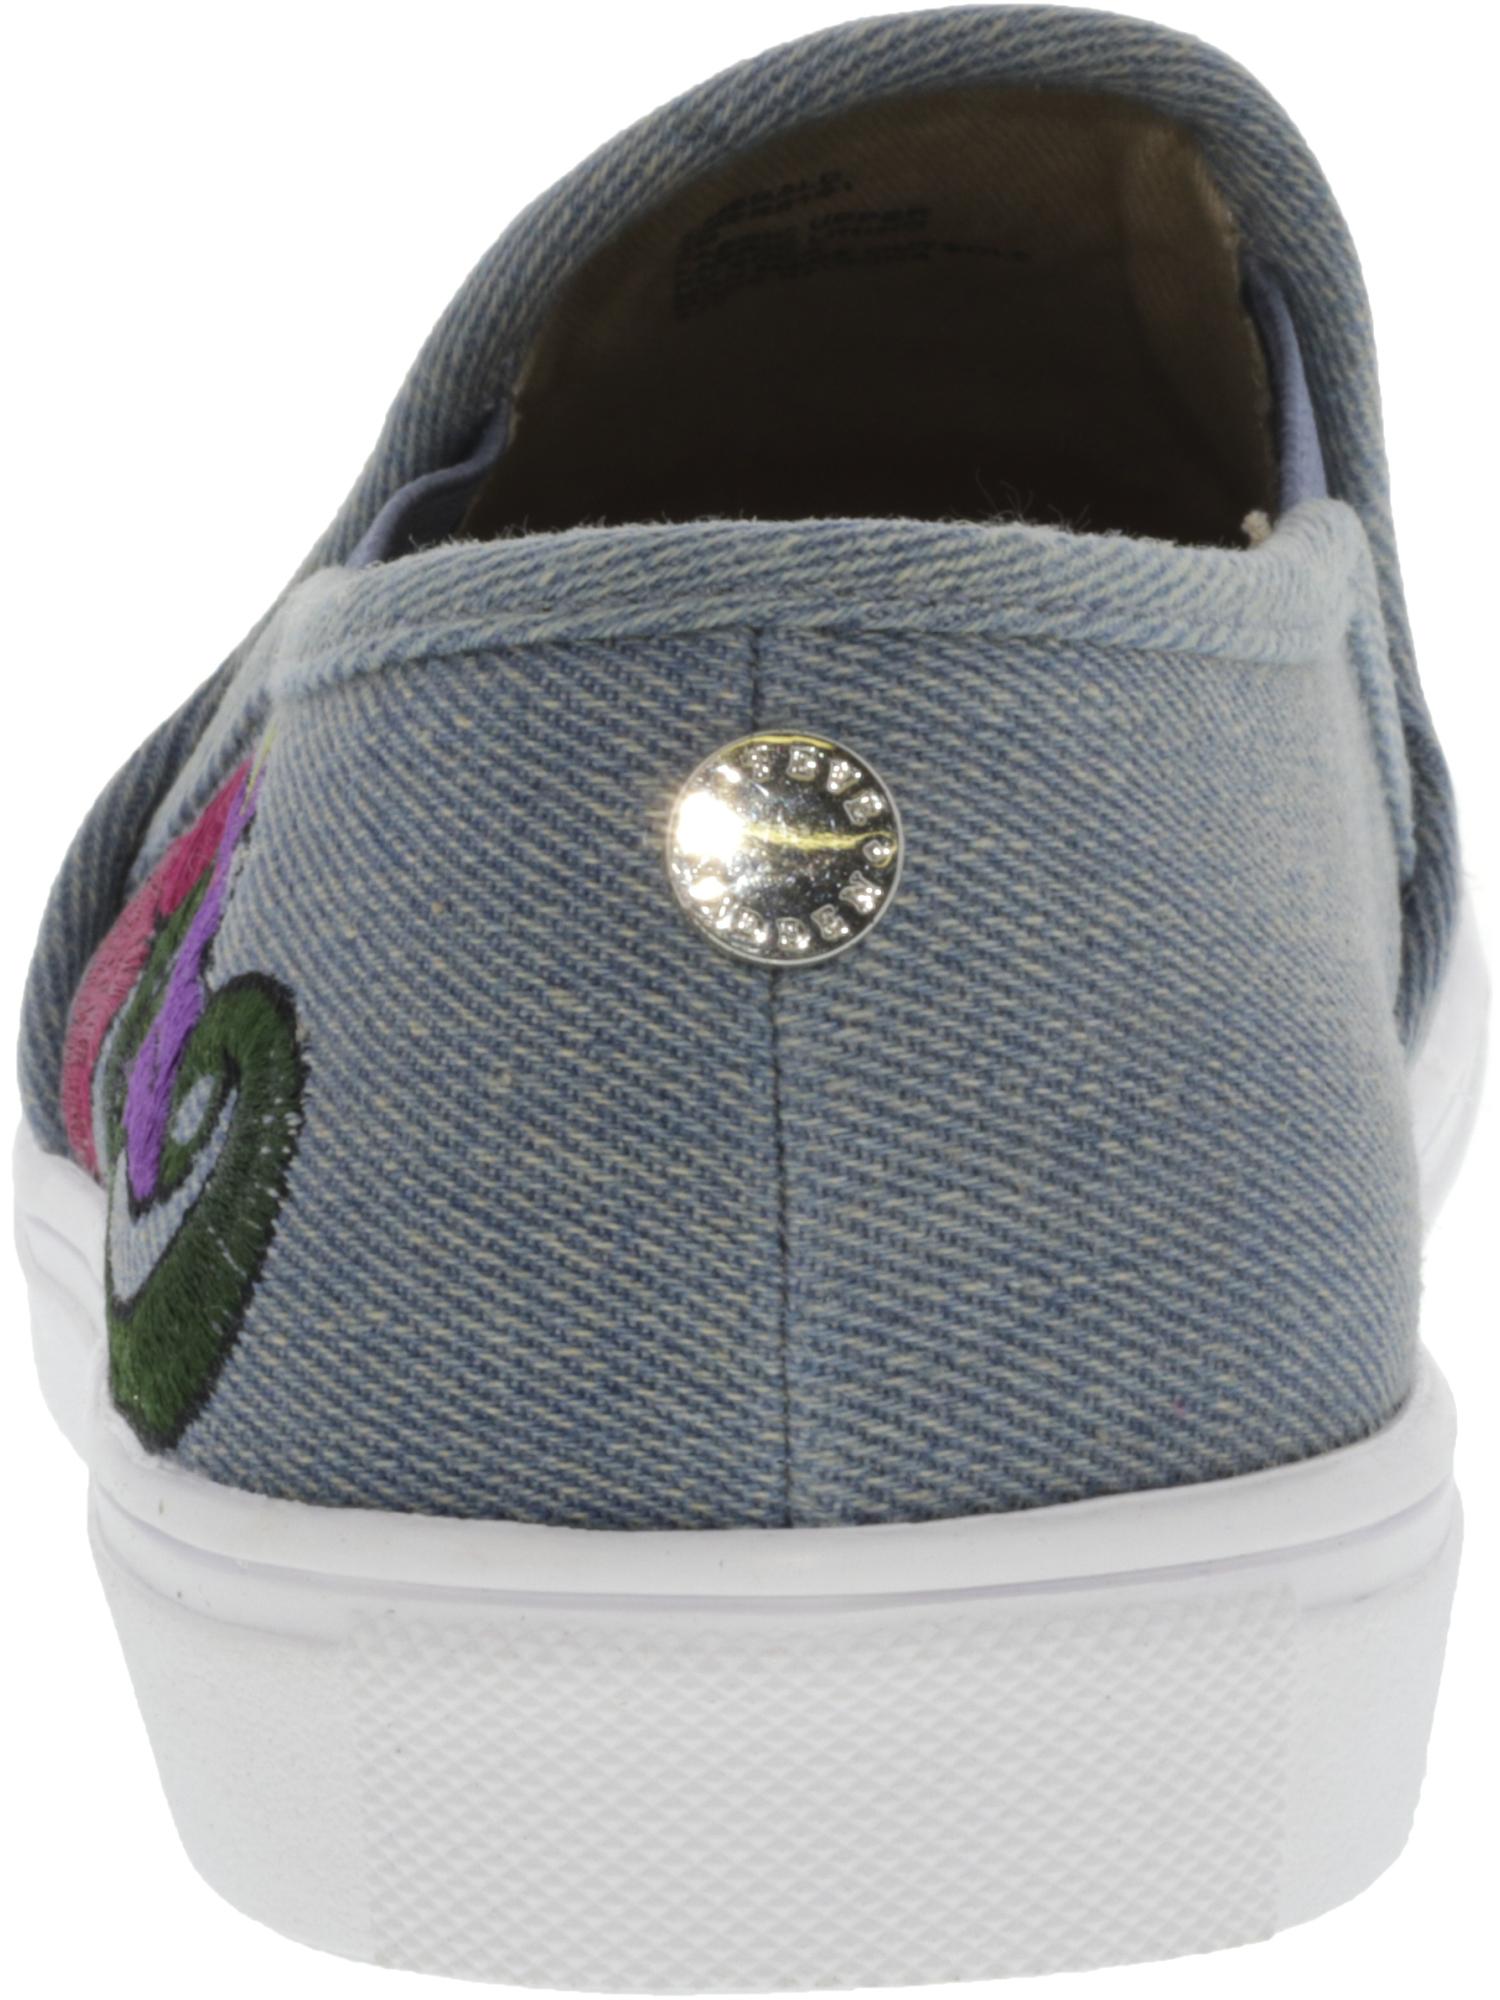 158f7b916ab Steve Madden Women s Emerald Ankle-High Fabric Slip-On Shoes